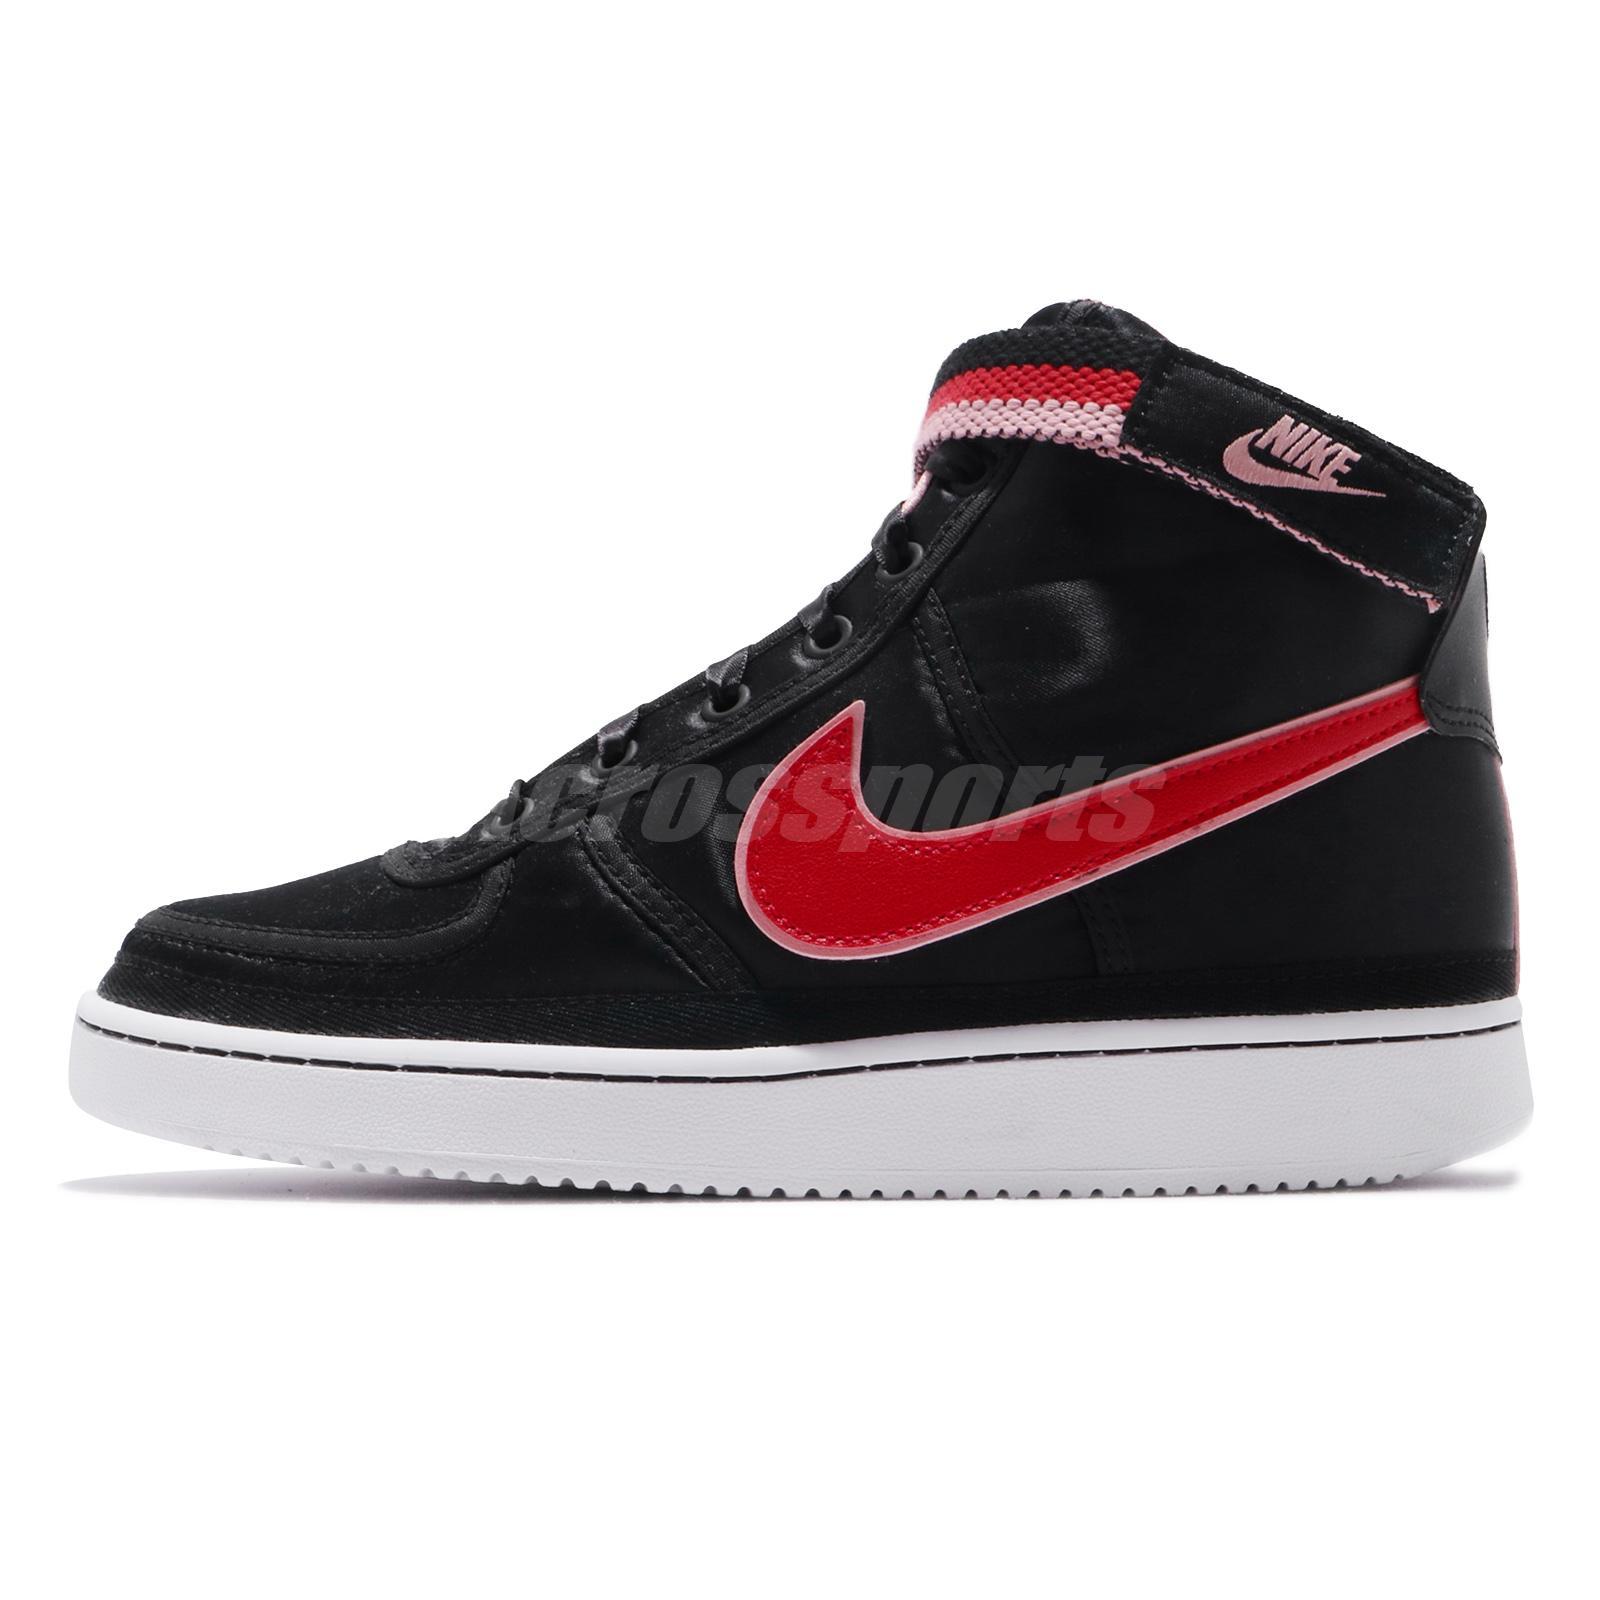 47af12f9a19 Nike Vandal High Supreme QS (GS) Casual Kids Youth Womens Shoes Black  AQ3713-001